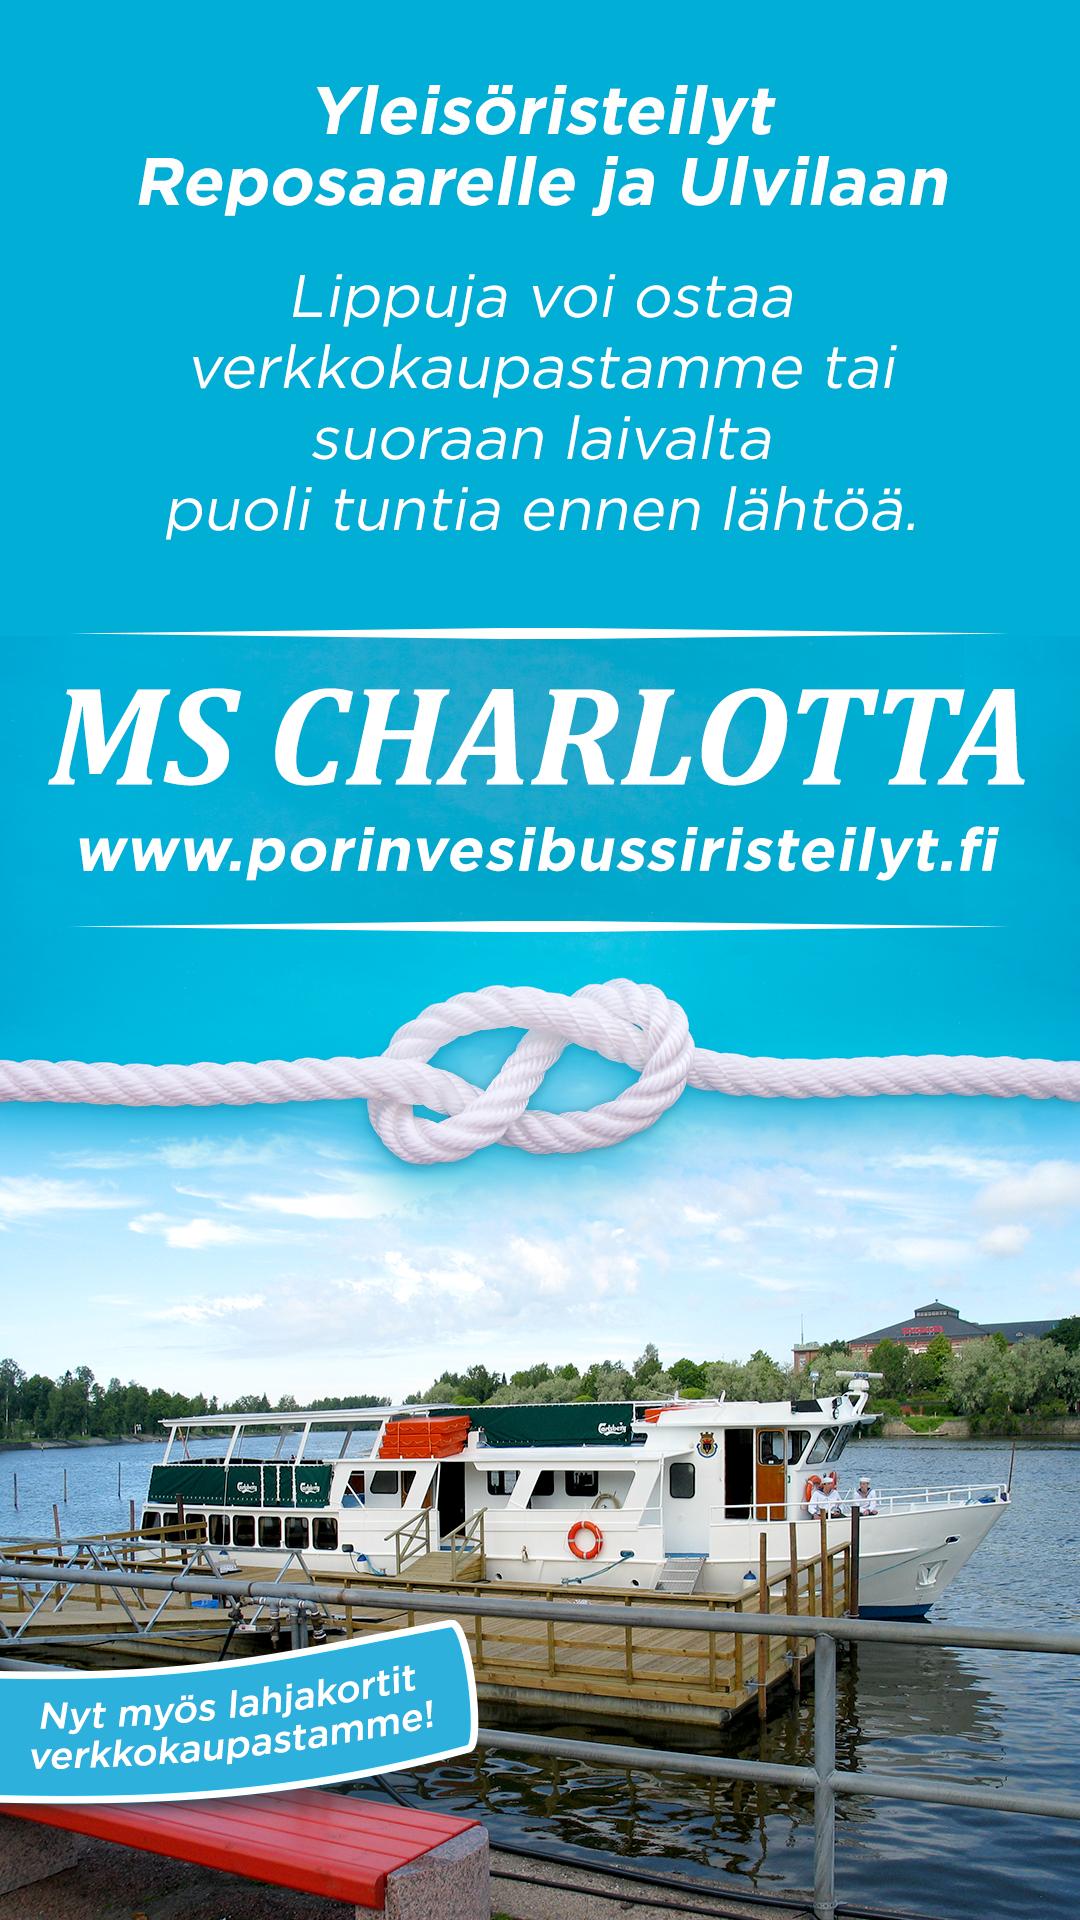 Yleisöristeily Porista Ulvilaan ke 22.7